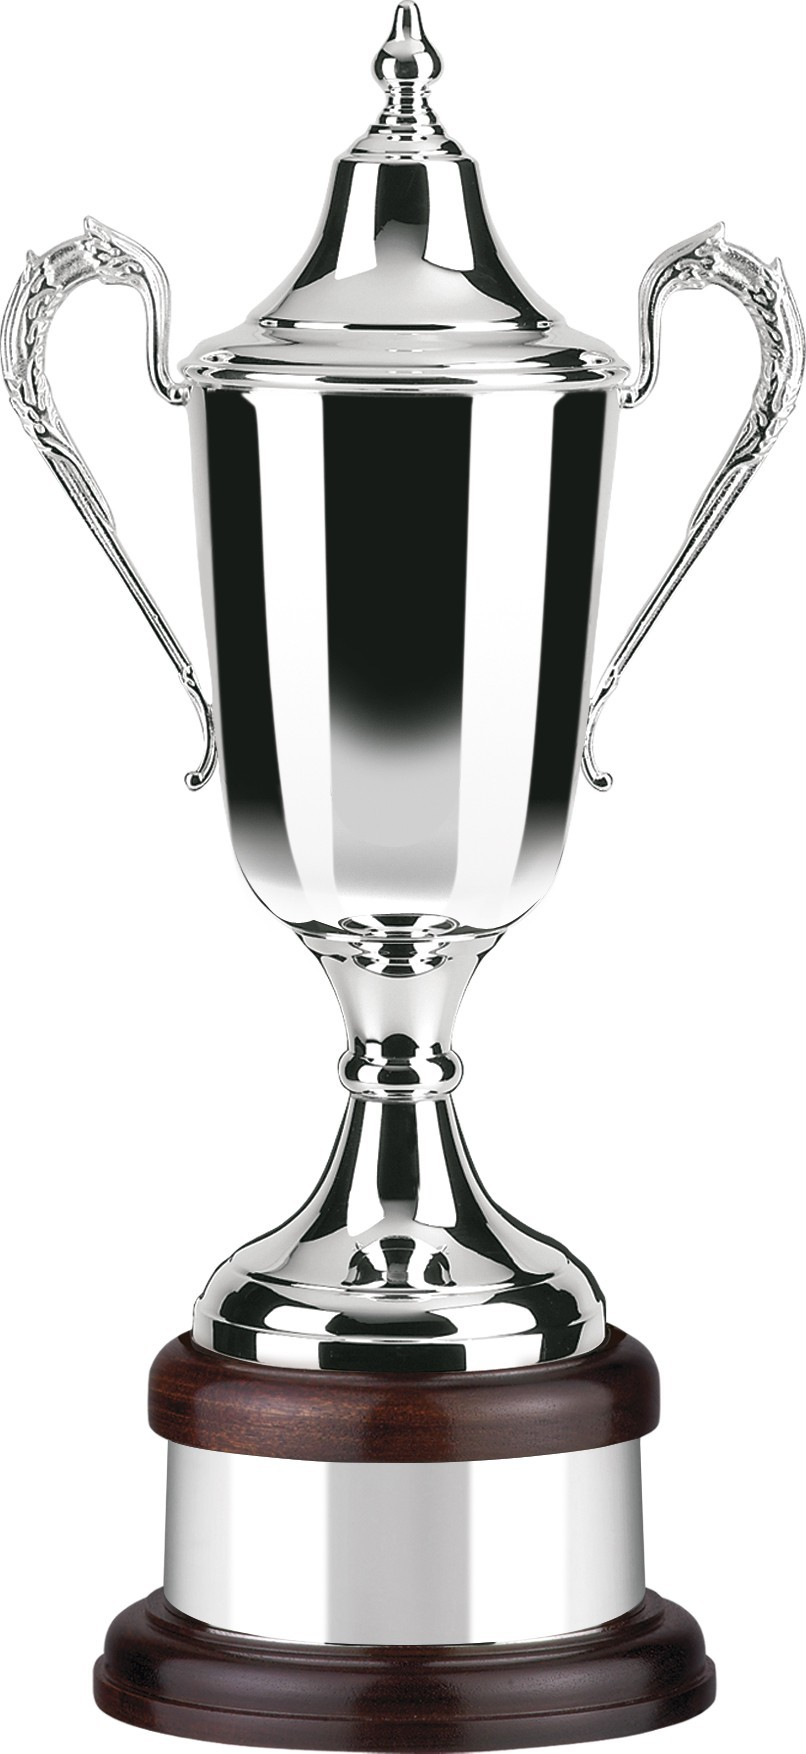 38cm Plain Bodied Silver Plated Supreme Award